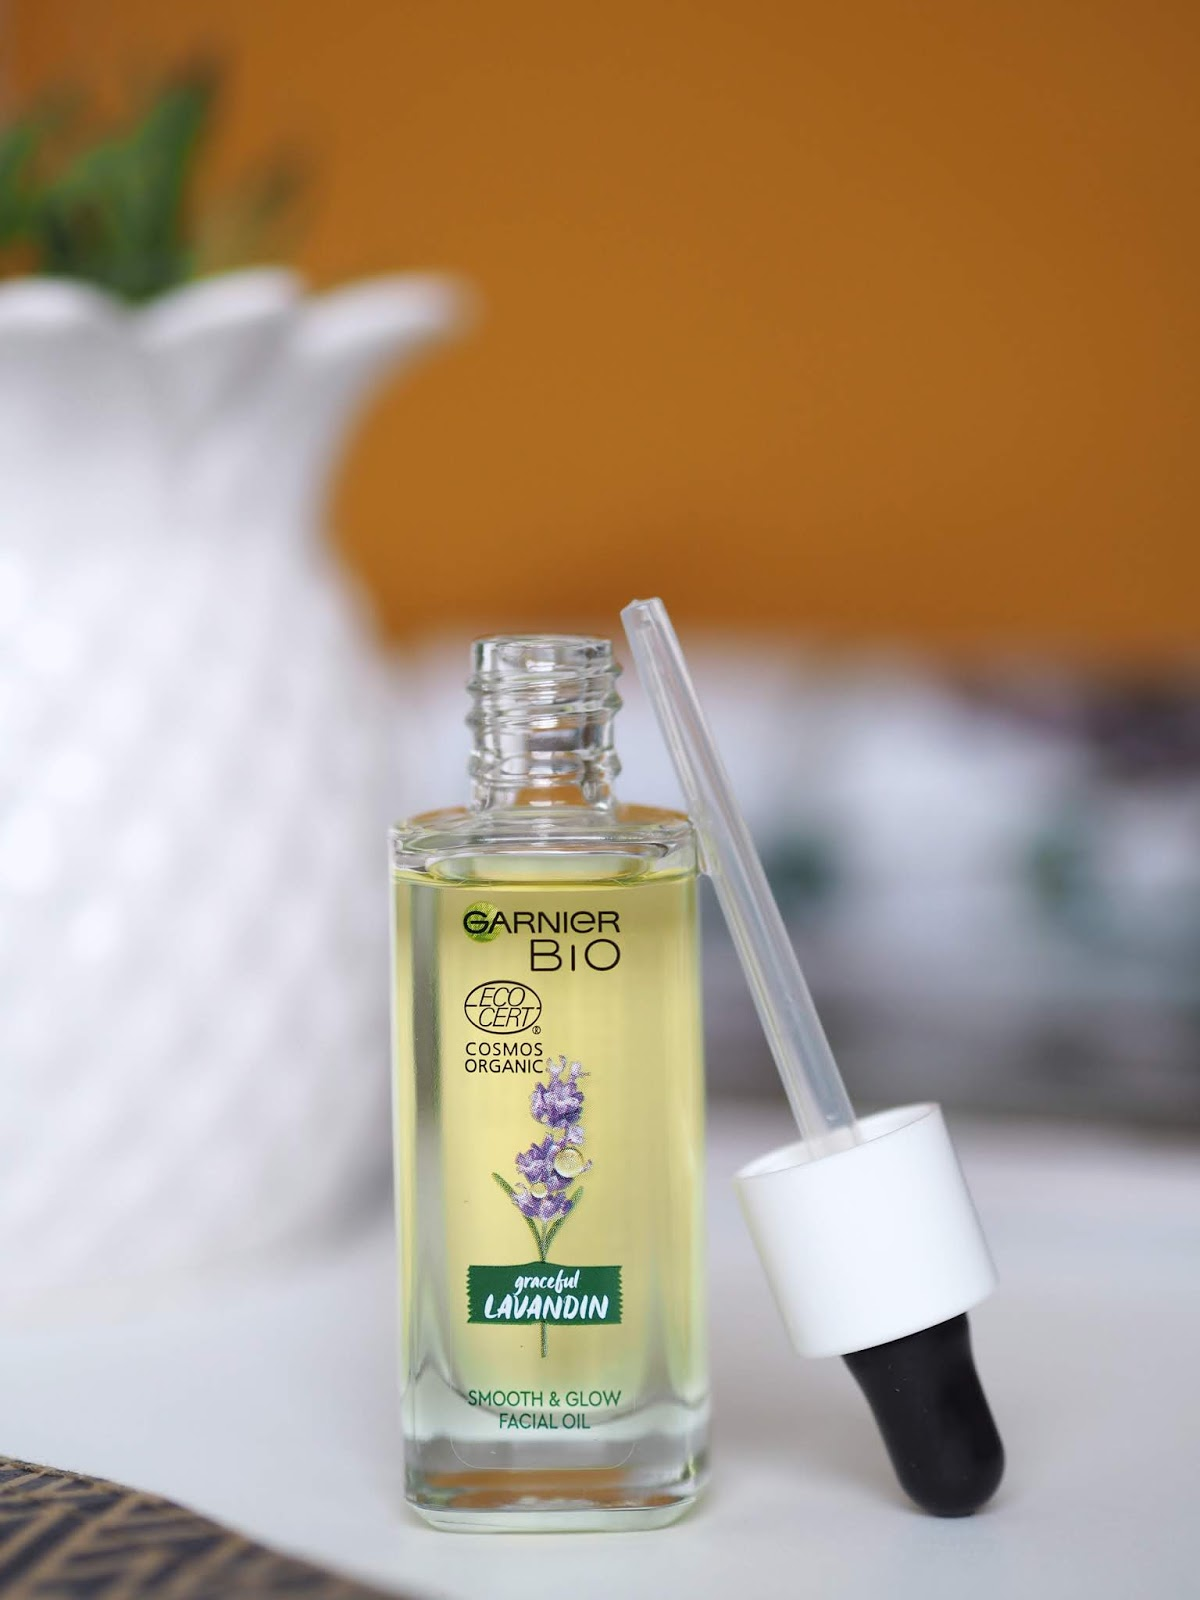 Garnier Bio Lavandin Smooth and Glow Facia Oil